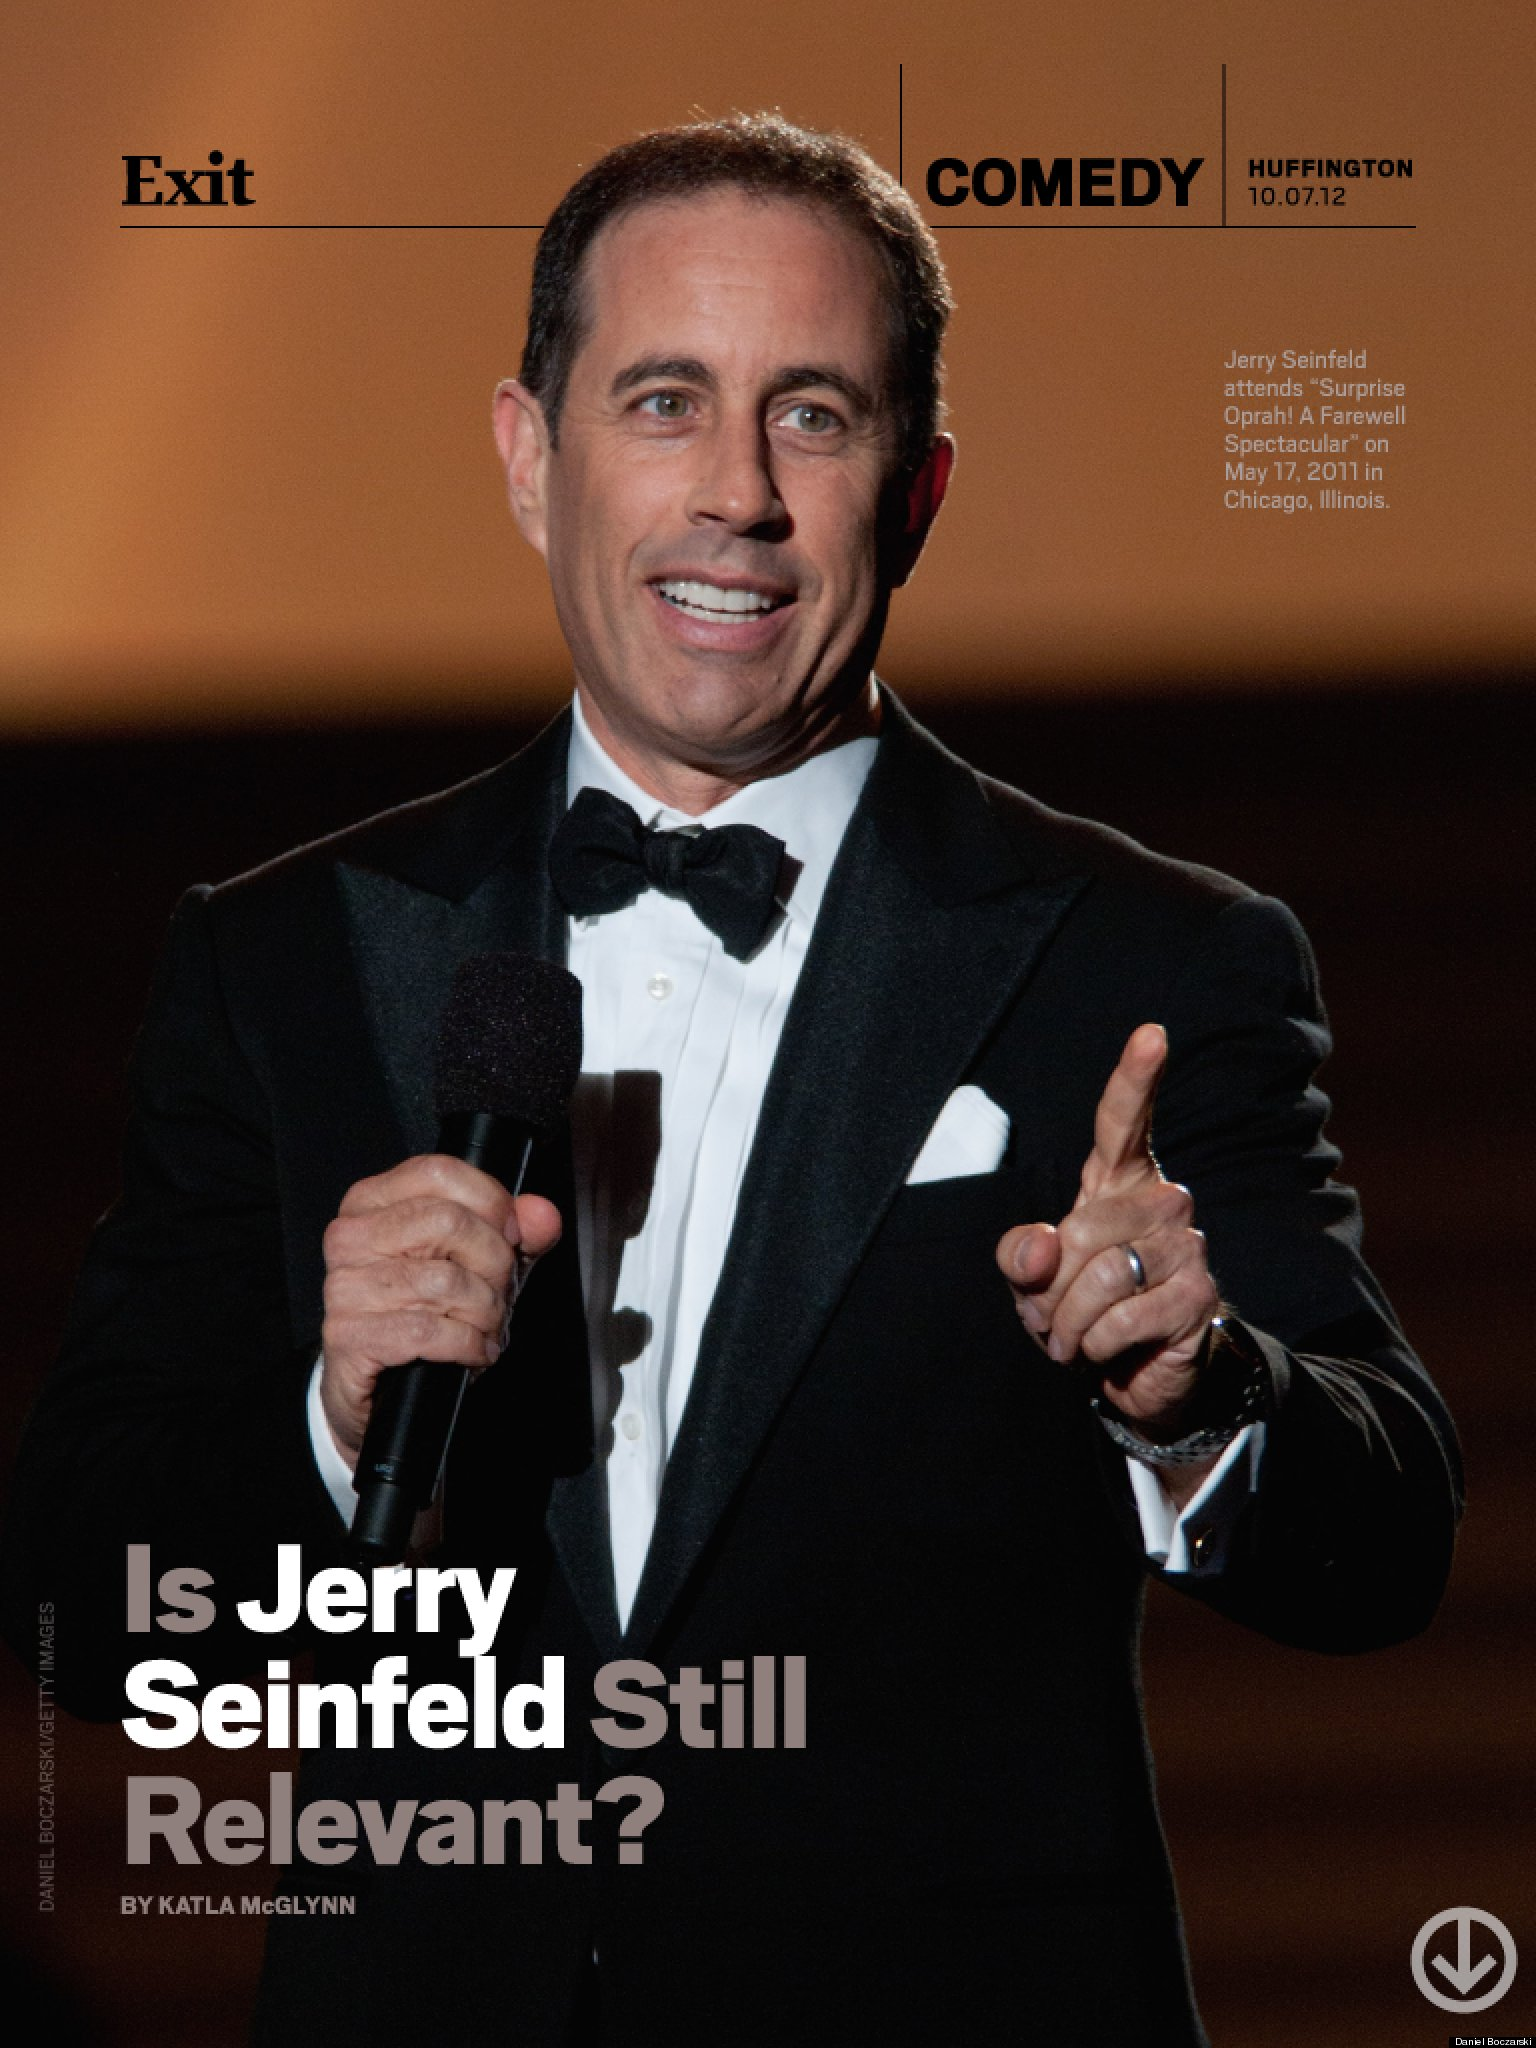 1000  images about Seinfeld-isms on Pinterest | Seinfeld meme ...